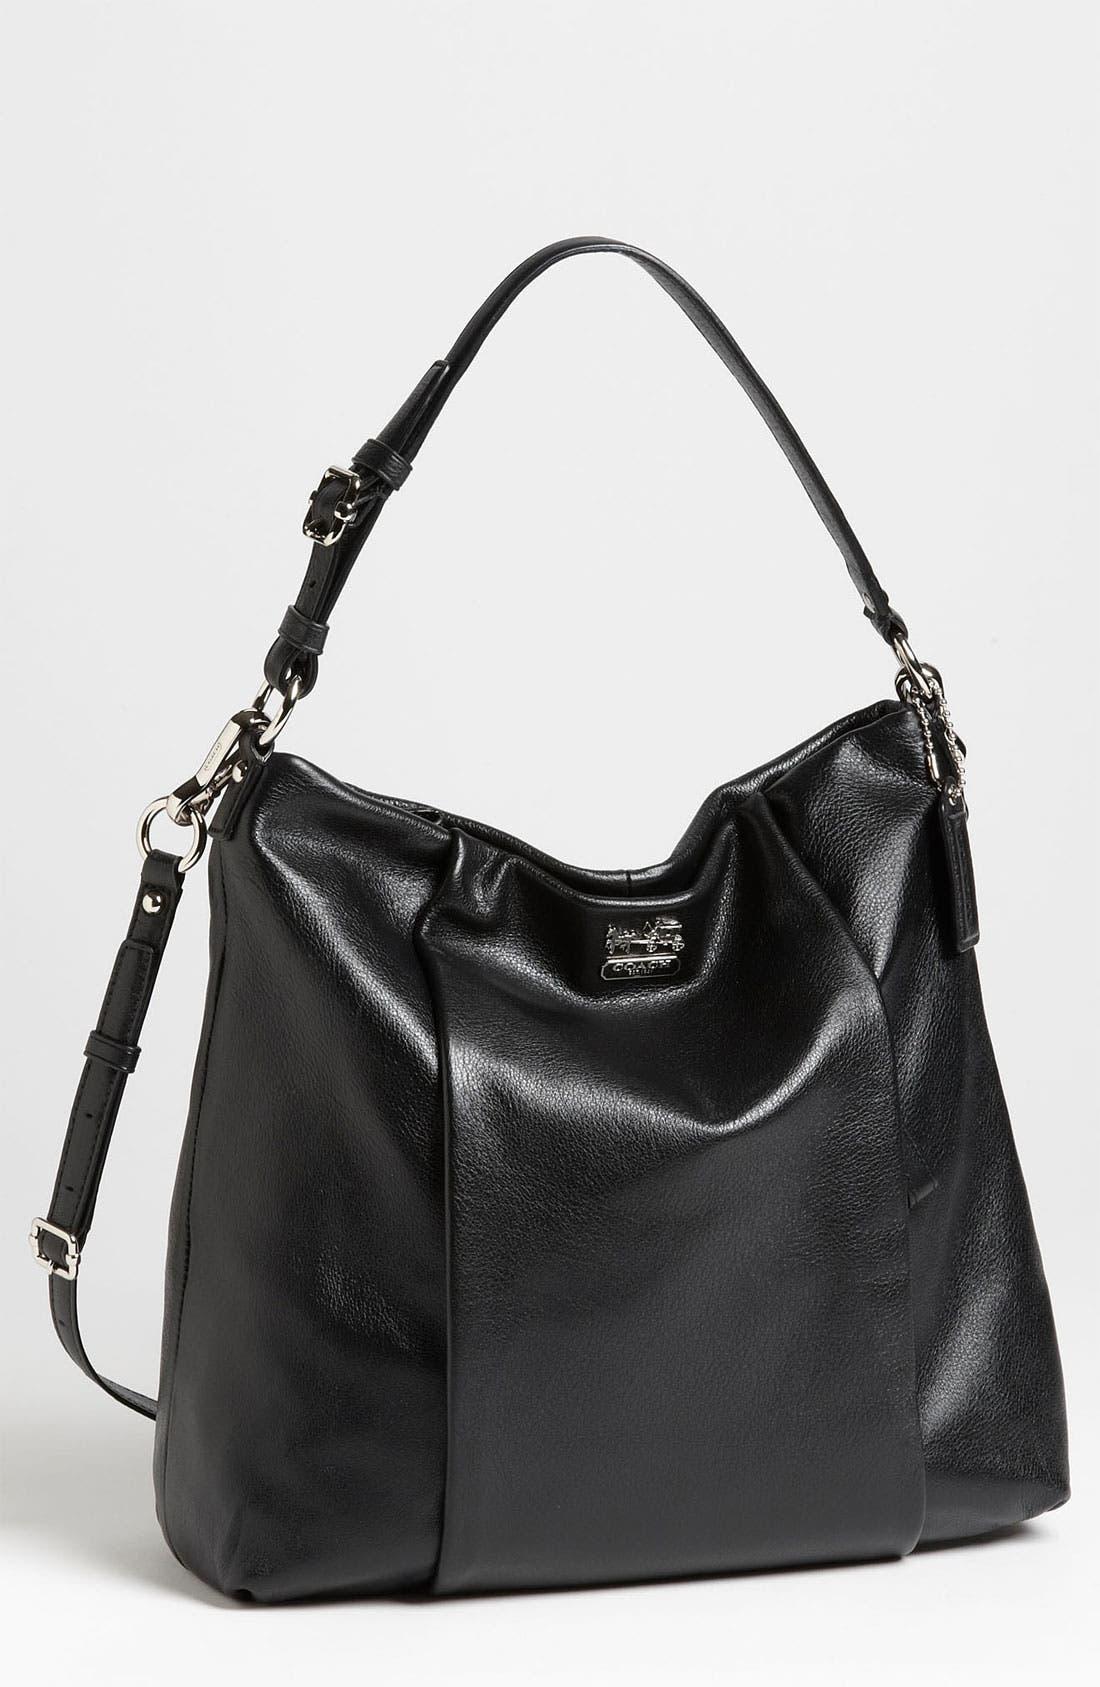 Alternate Image 1 Selected - COACH 'New Madison - Isabelle' Leather Shoulder Bag